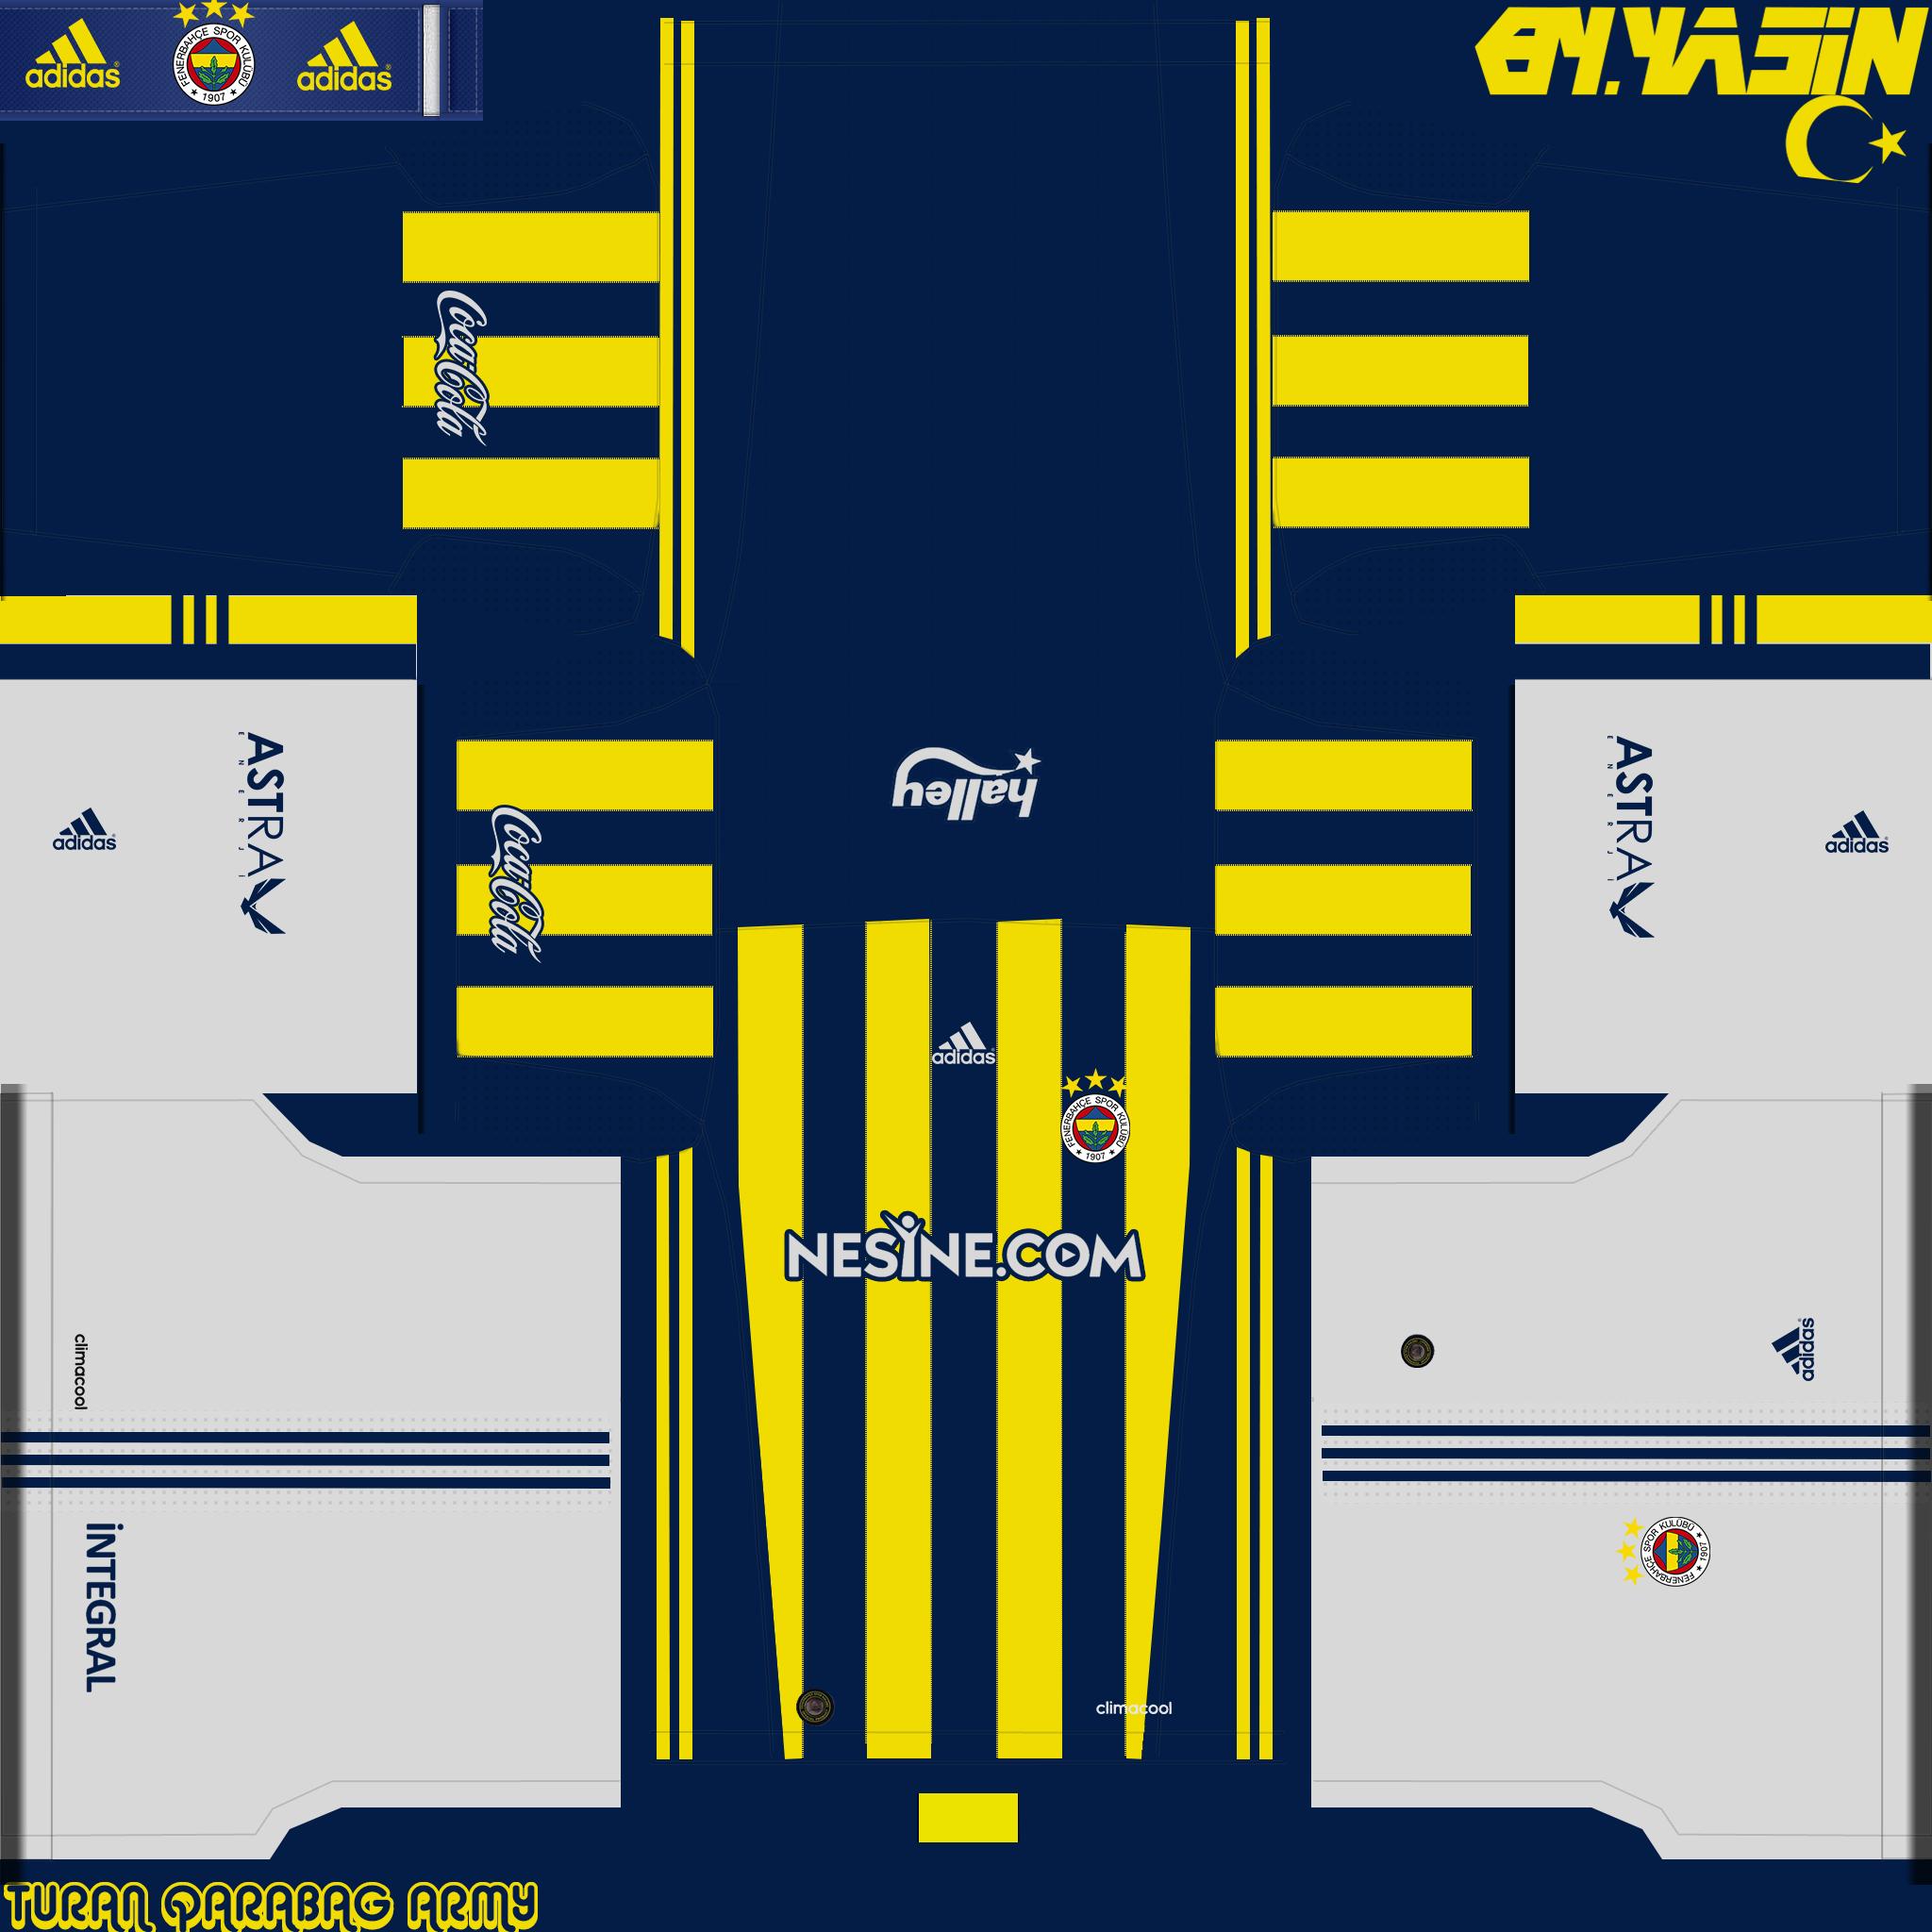 Fenerbahçe İç Saha 2.